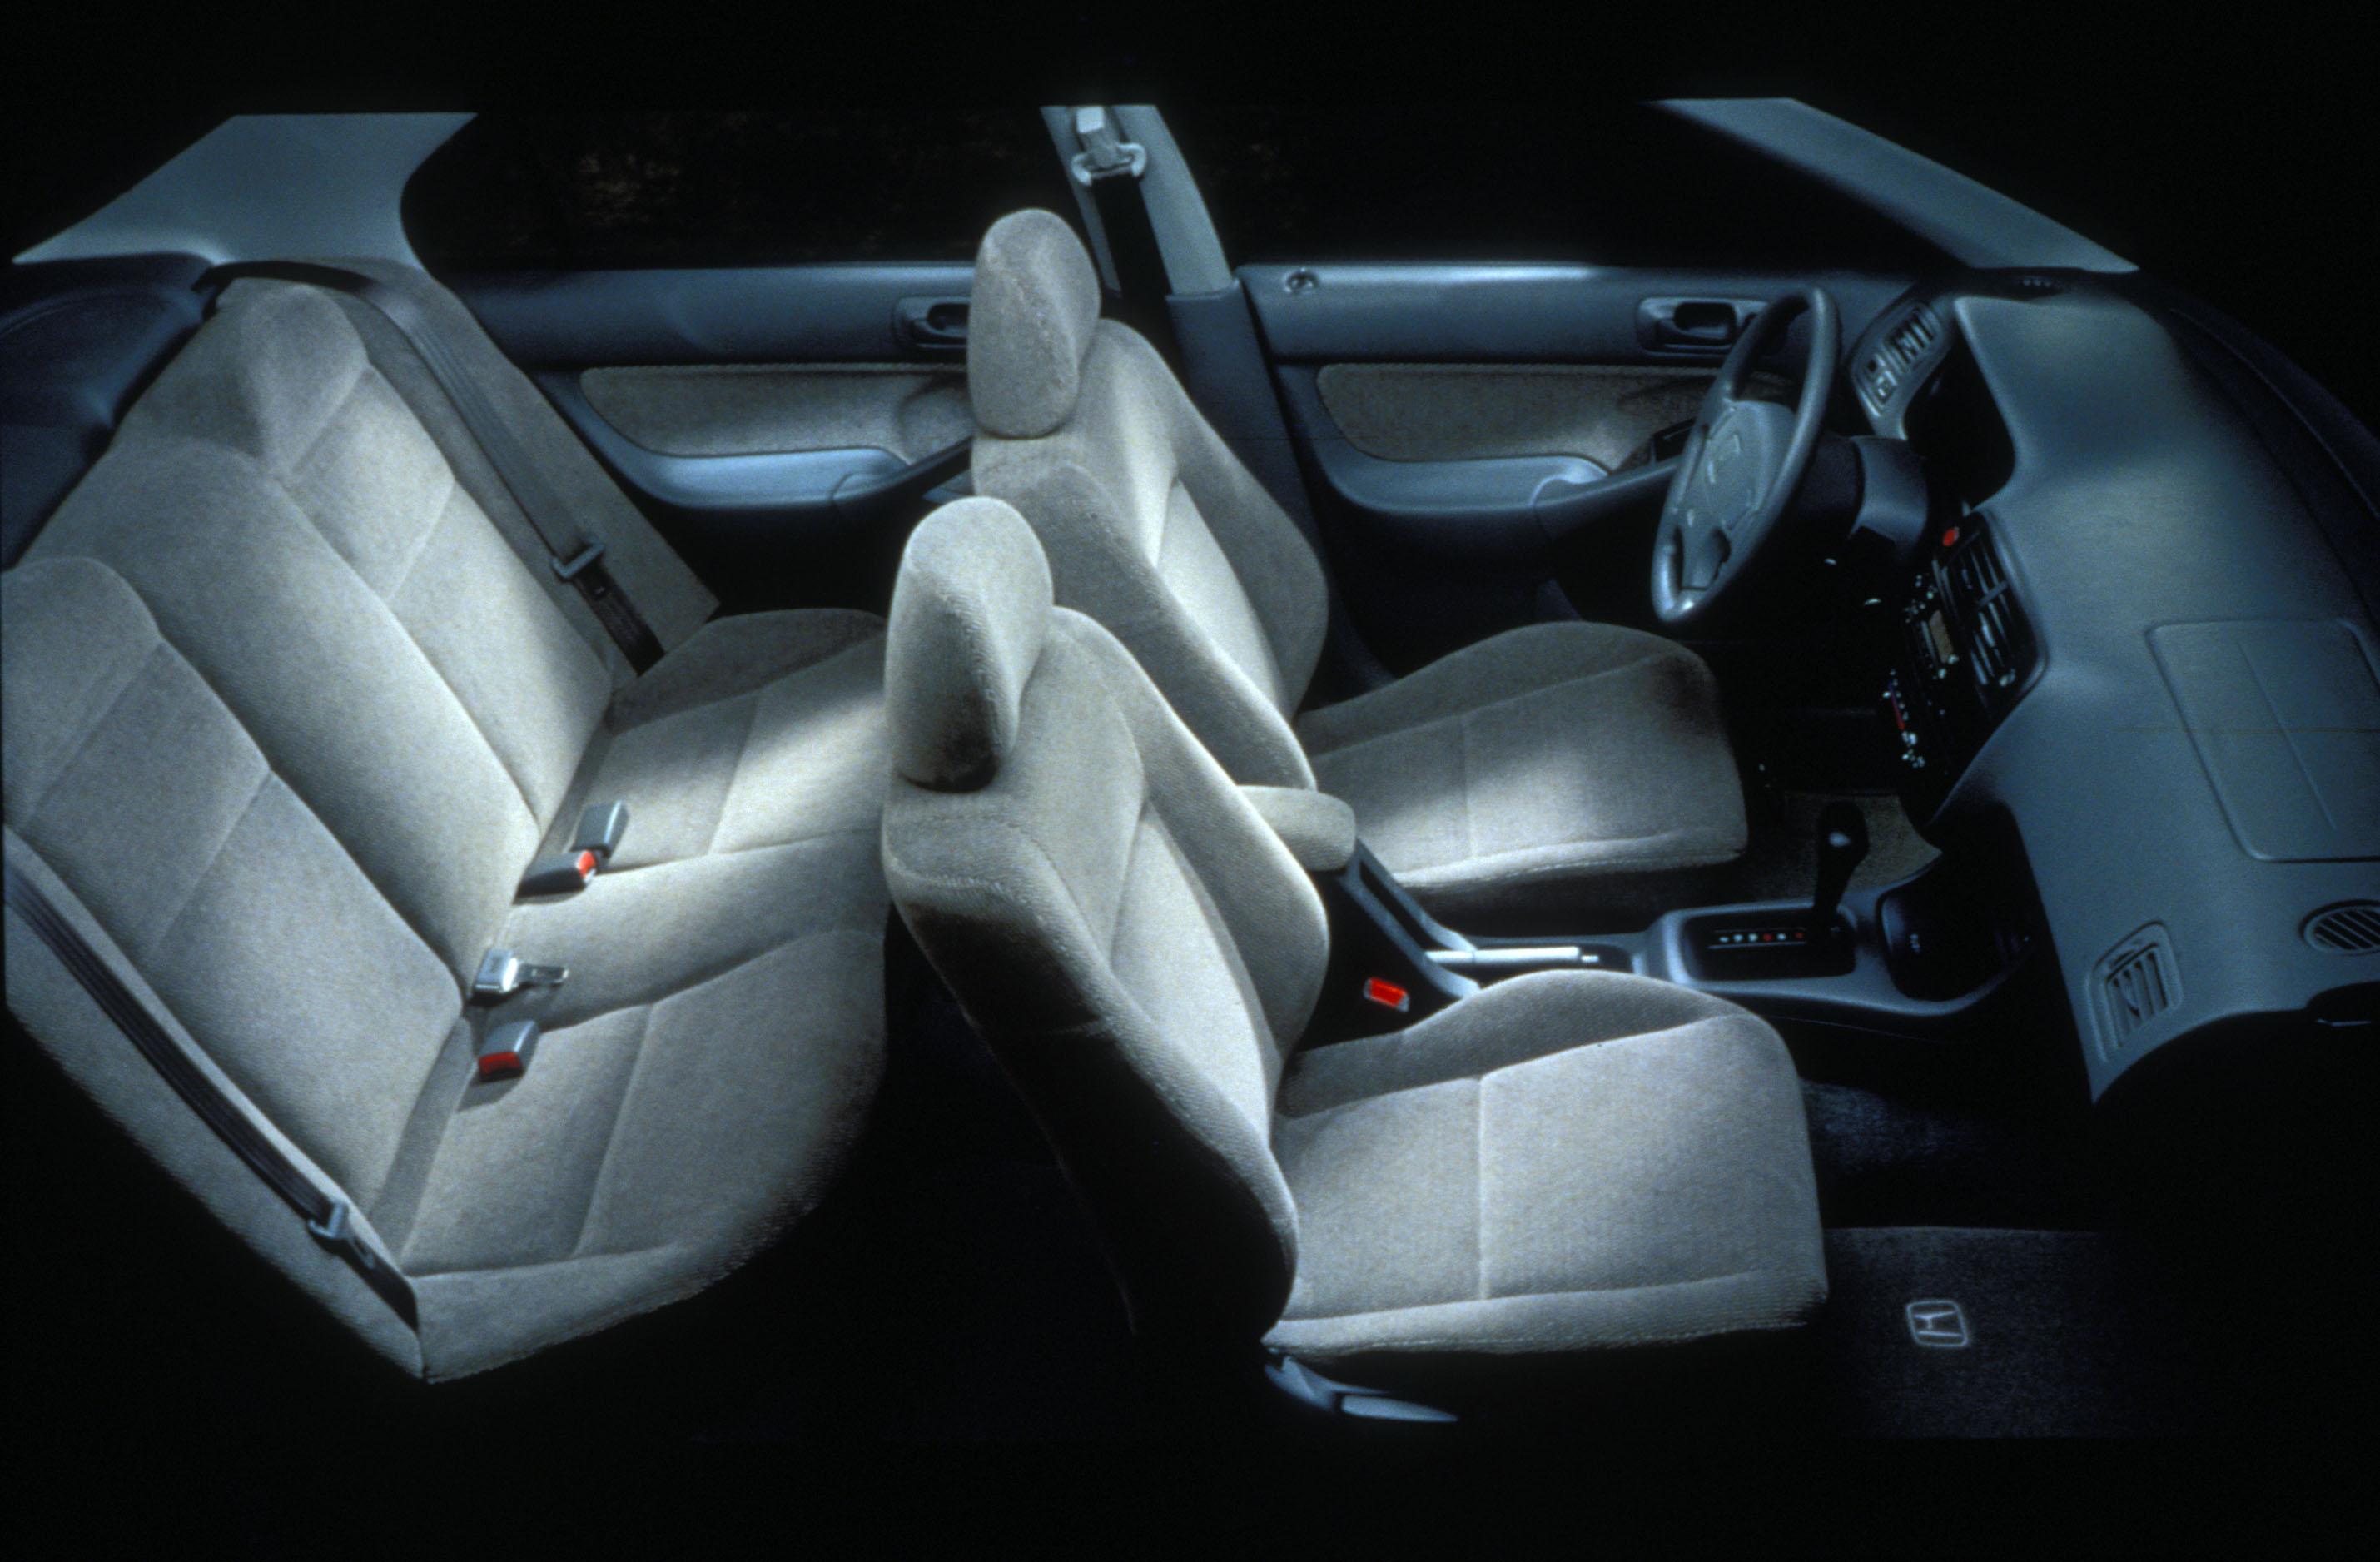 1996 Honda Civic interior